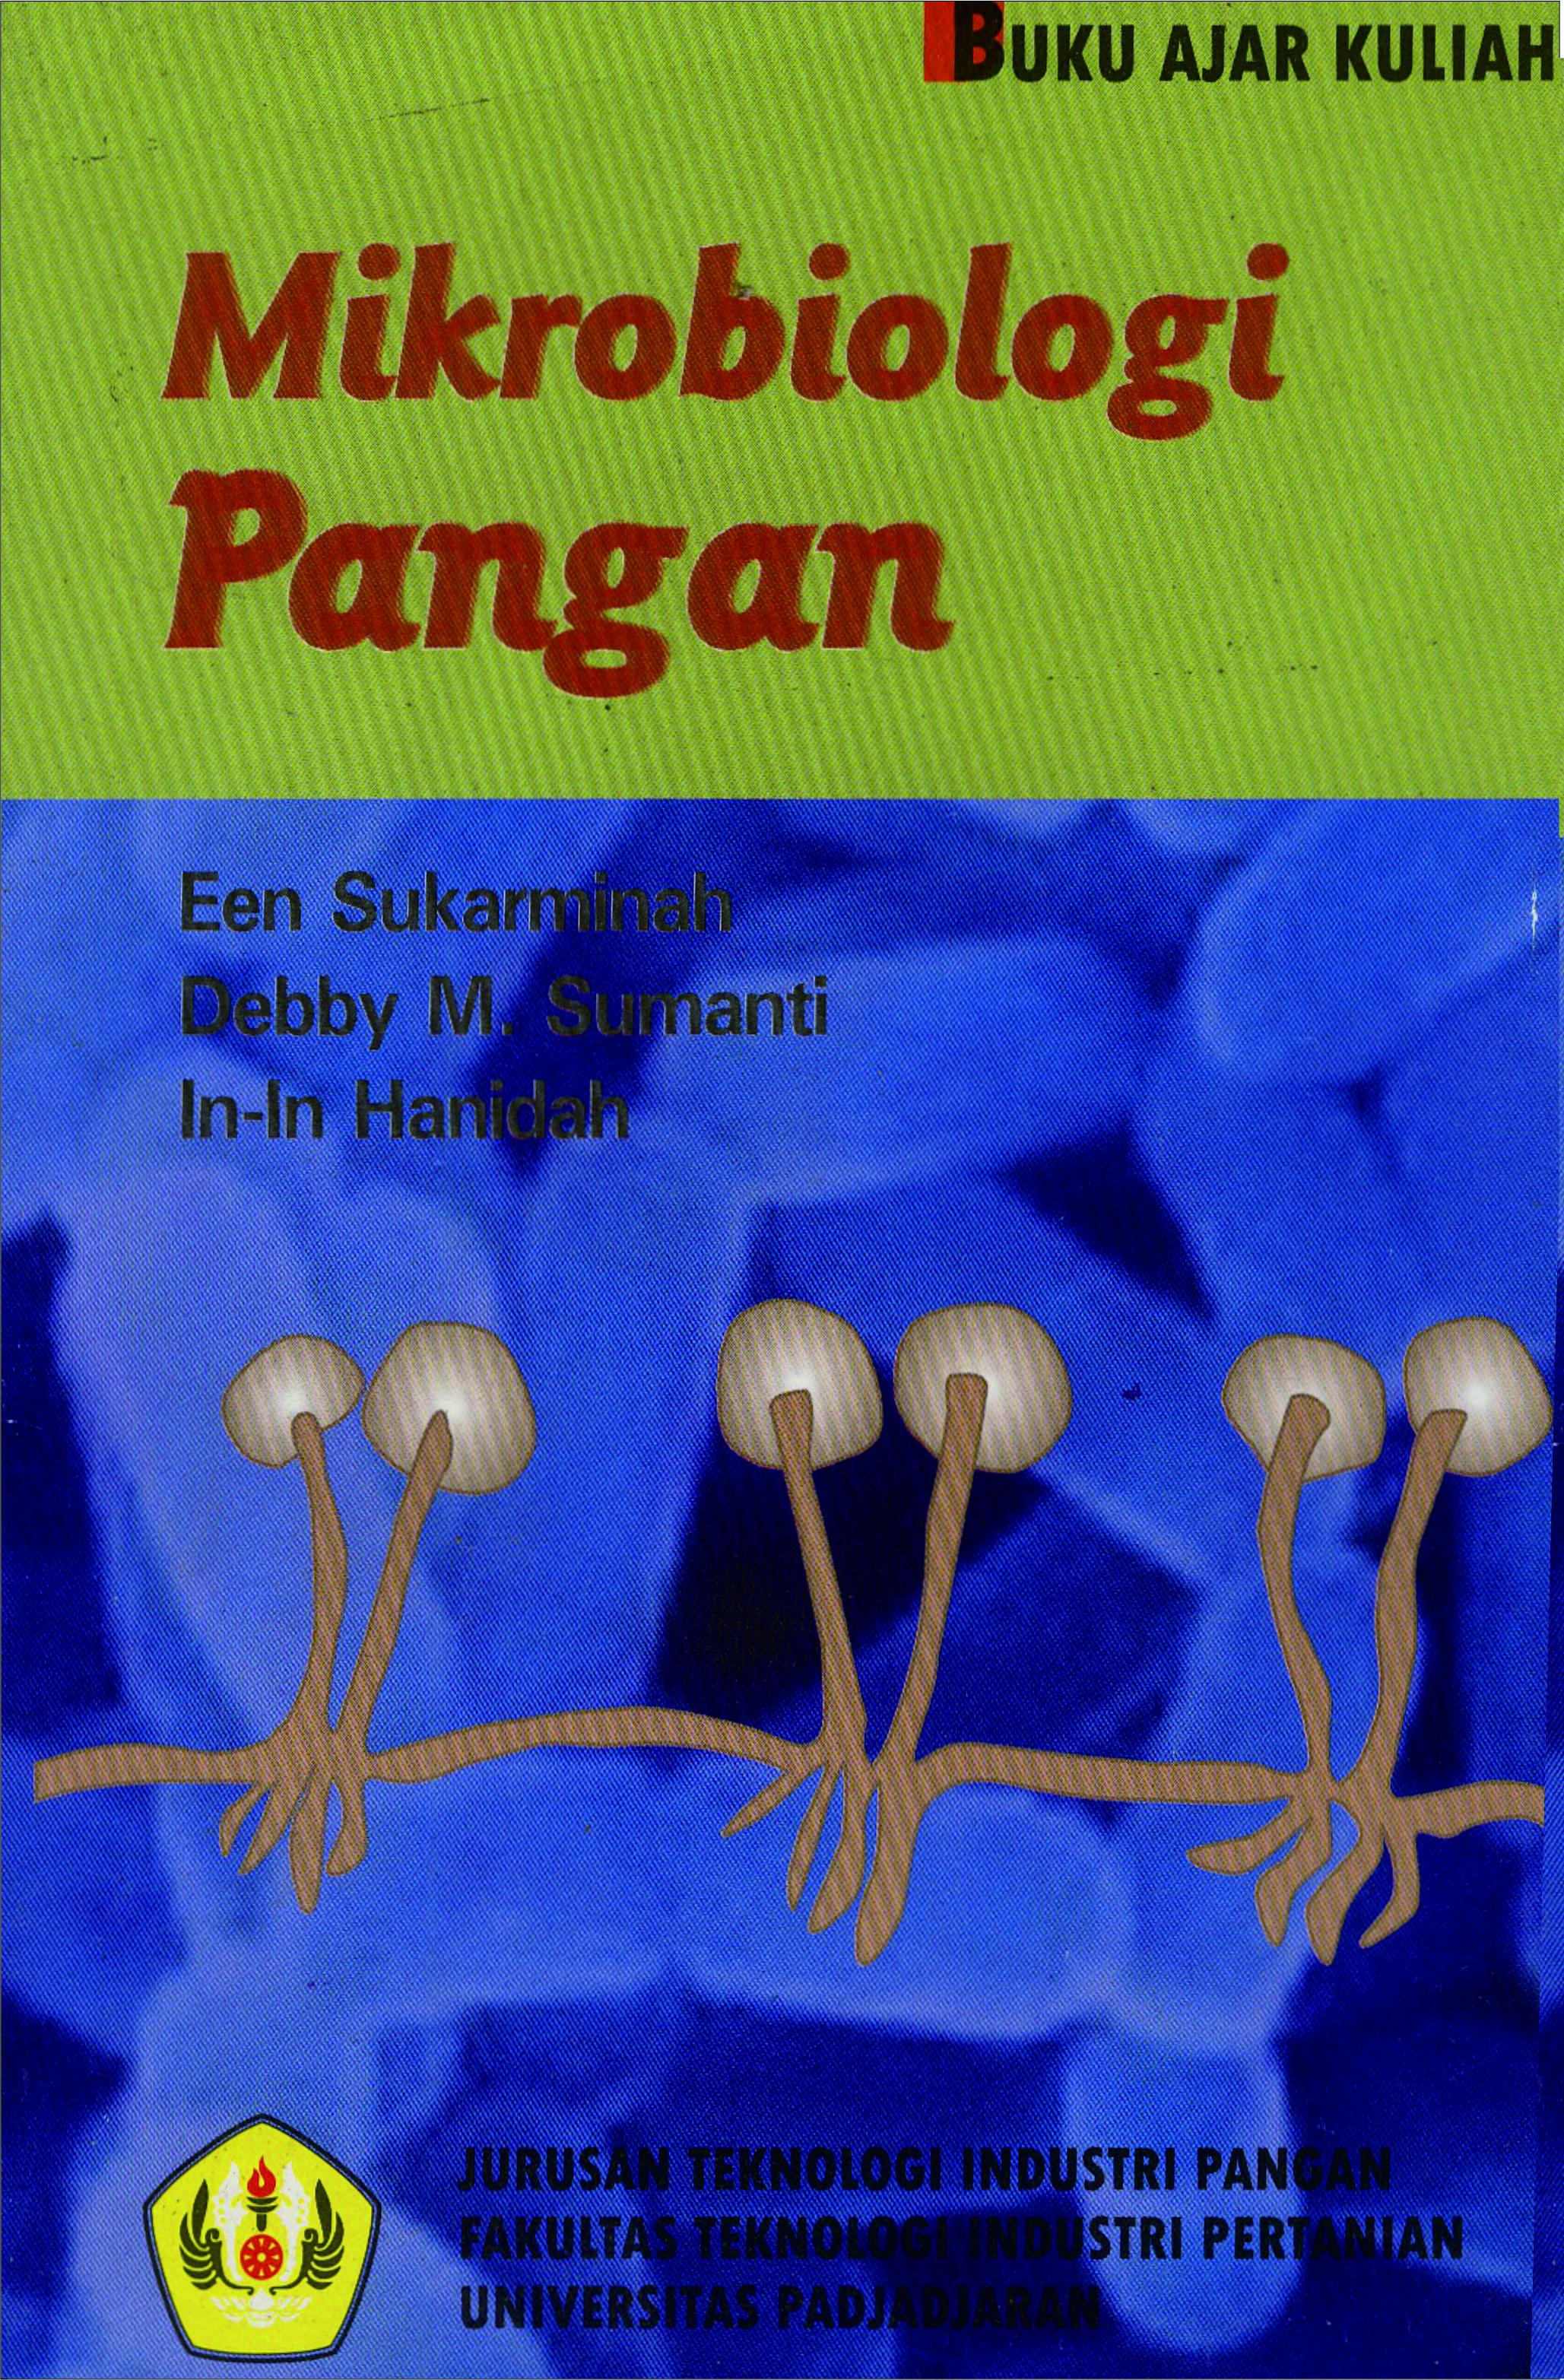 Mikrobiologi Pangan - Universitas Padjadjaran